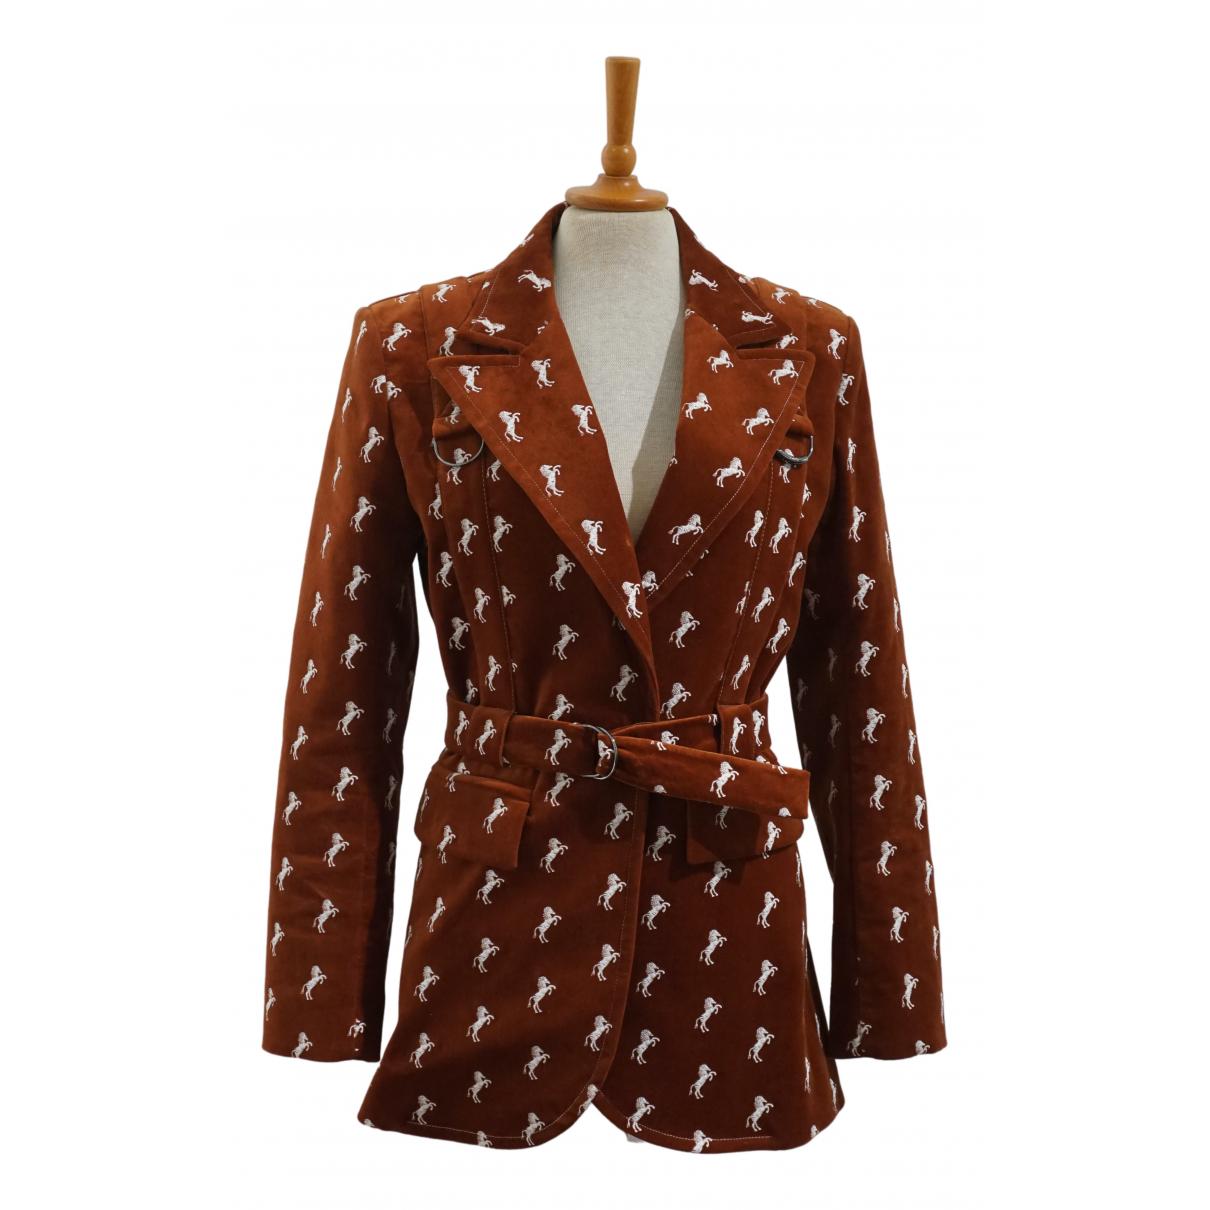 Chloé N Brown Cotton jacket for Women 38 FR